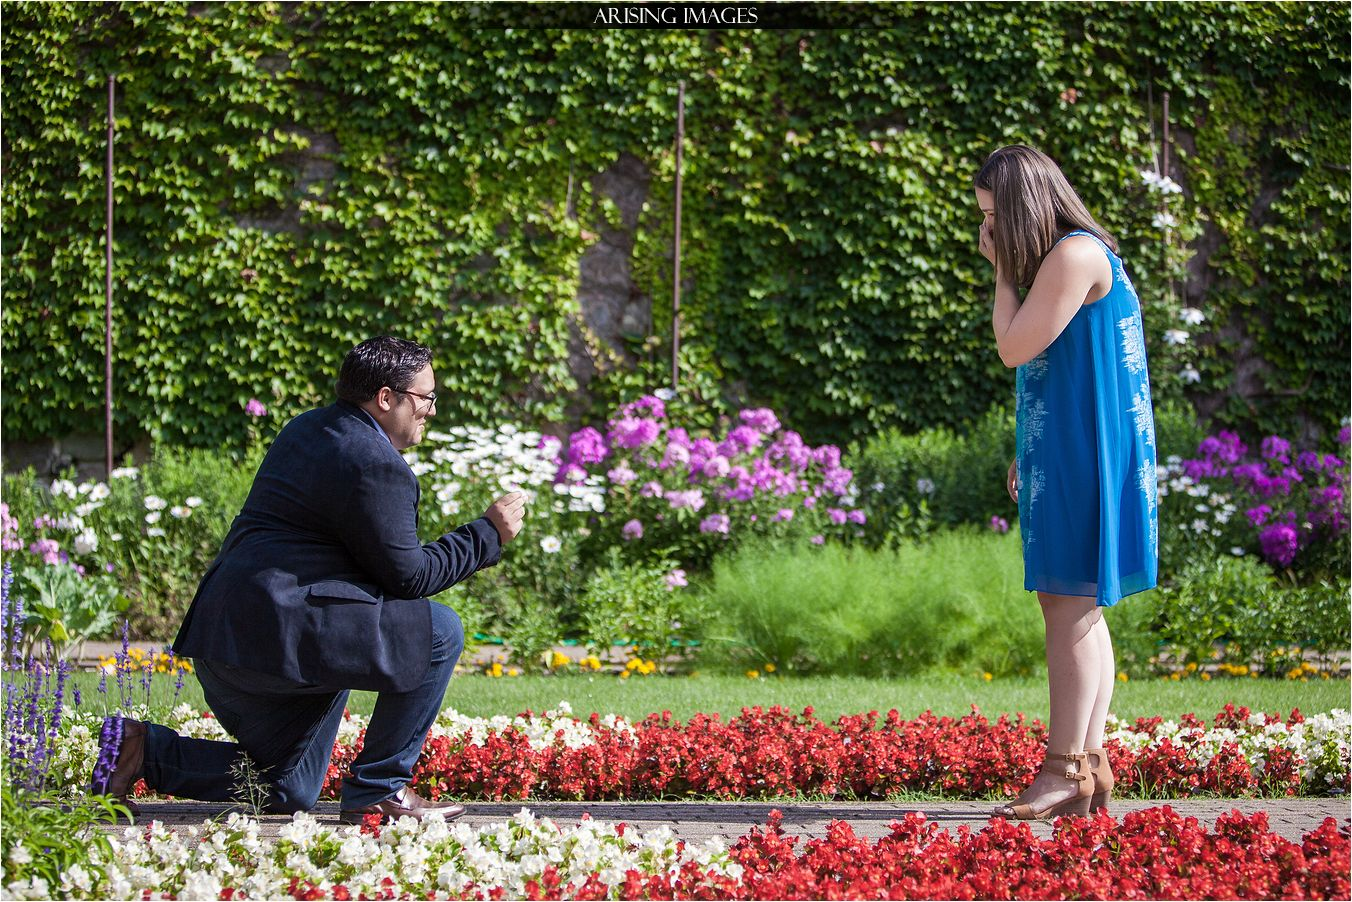 Cranbrook Proposal Photos with Matt and Danielle - Arising Images